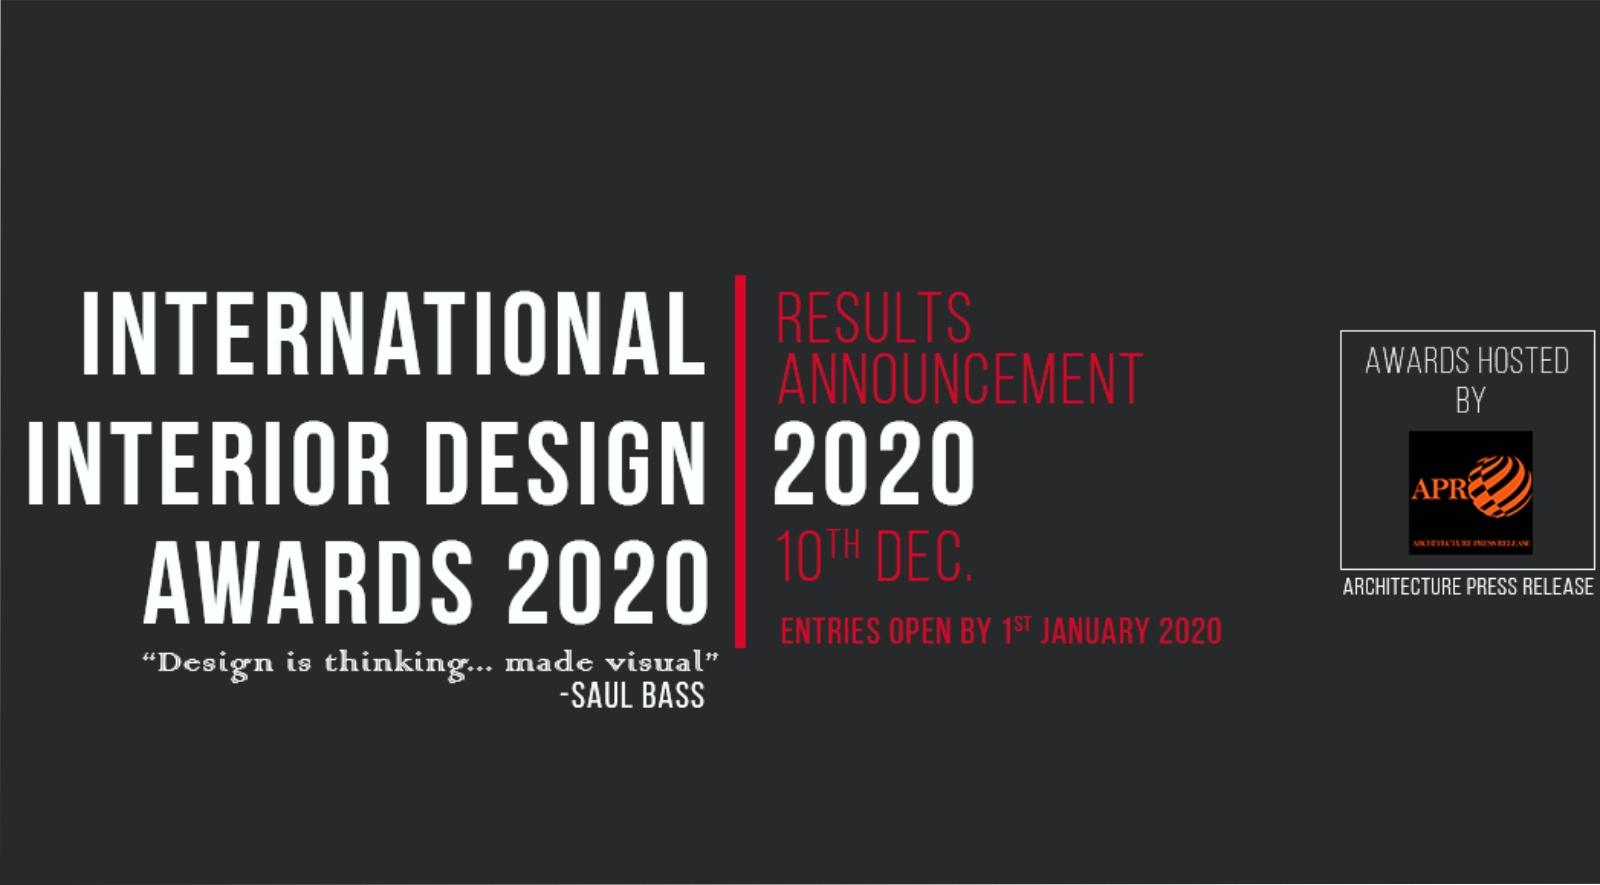 International Interior Design Awards